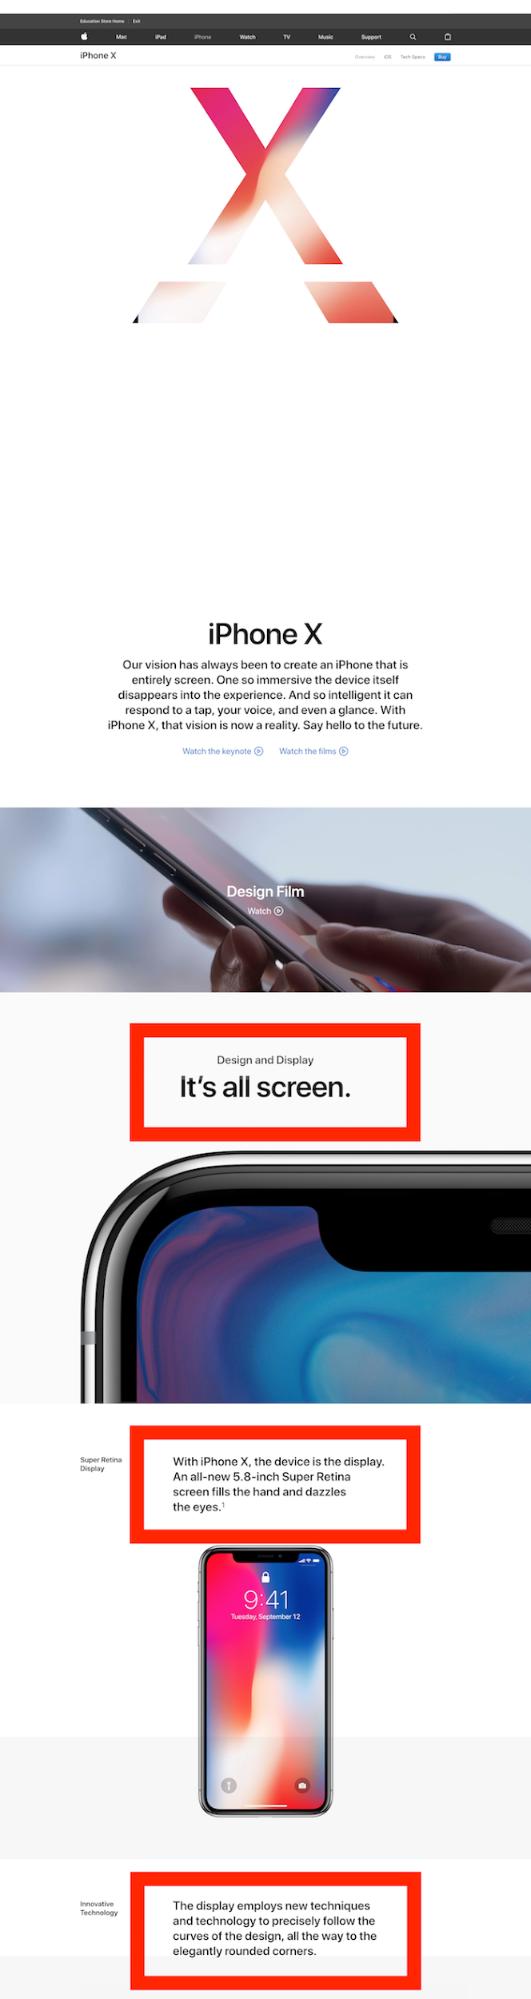 Screenshot showing apple